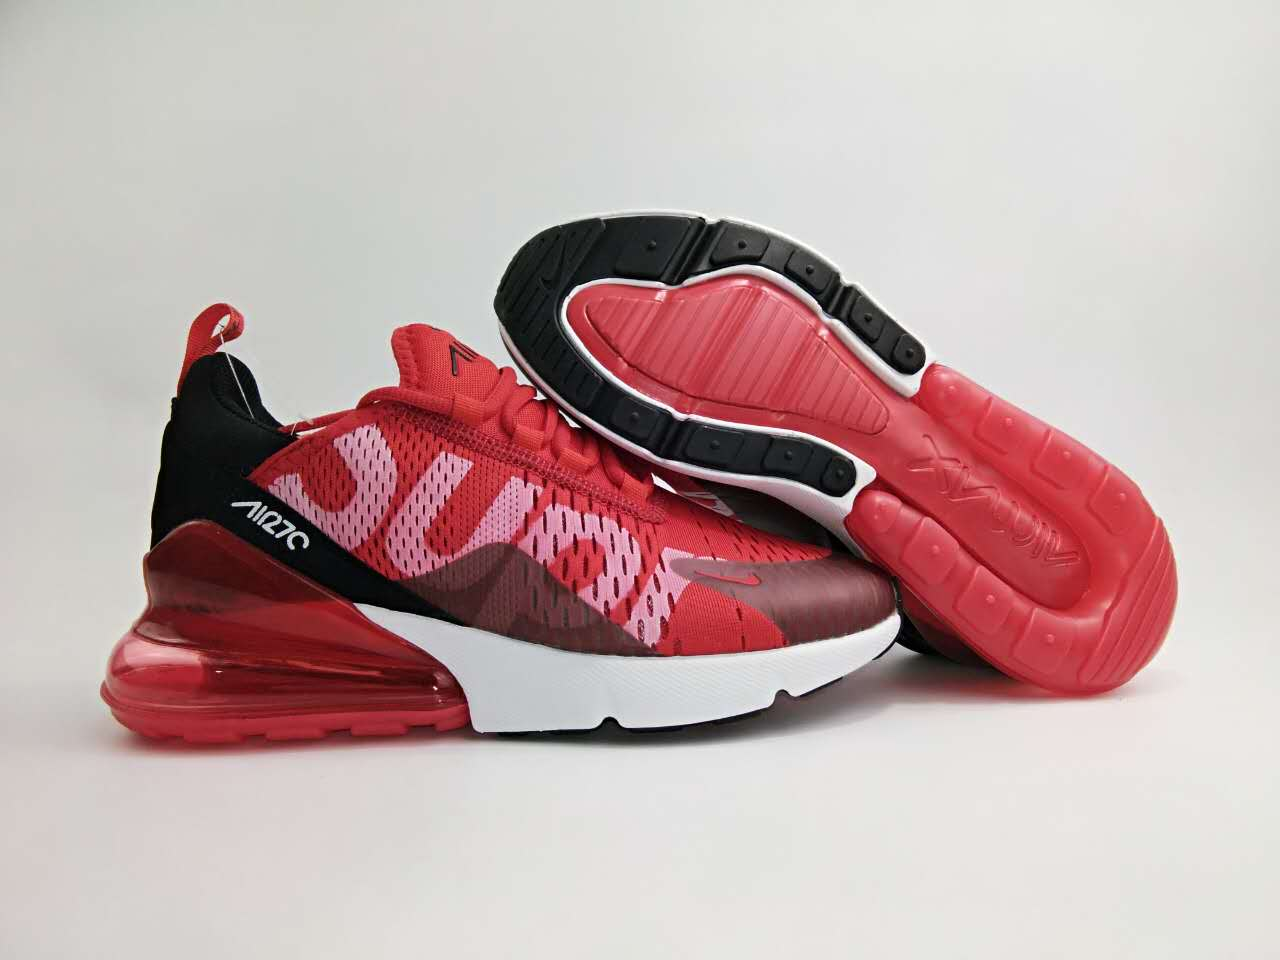 8068a2556a66a8 ... germany women nike air max flair 270 nano red black white shoes 30be2  bf39d